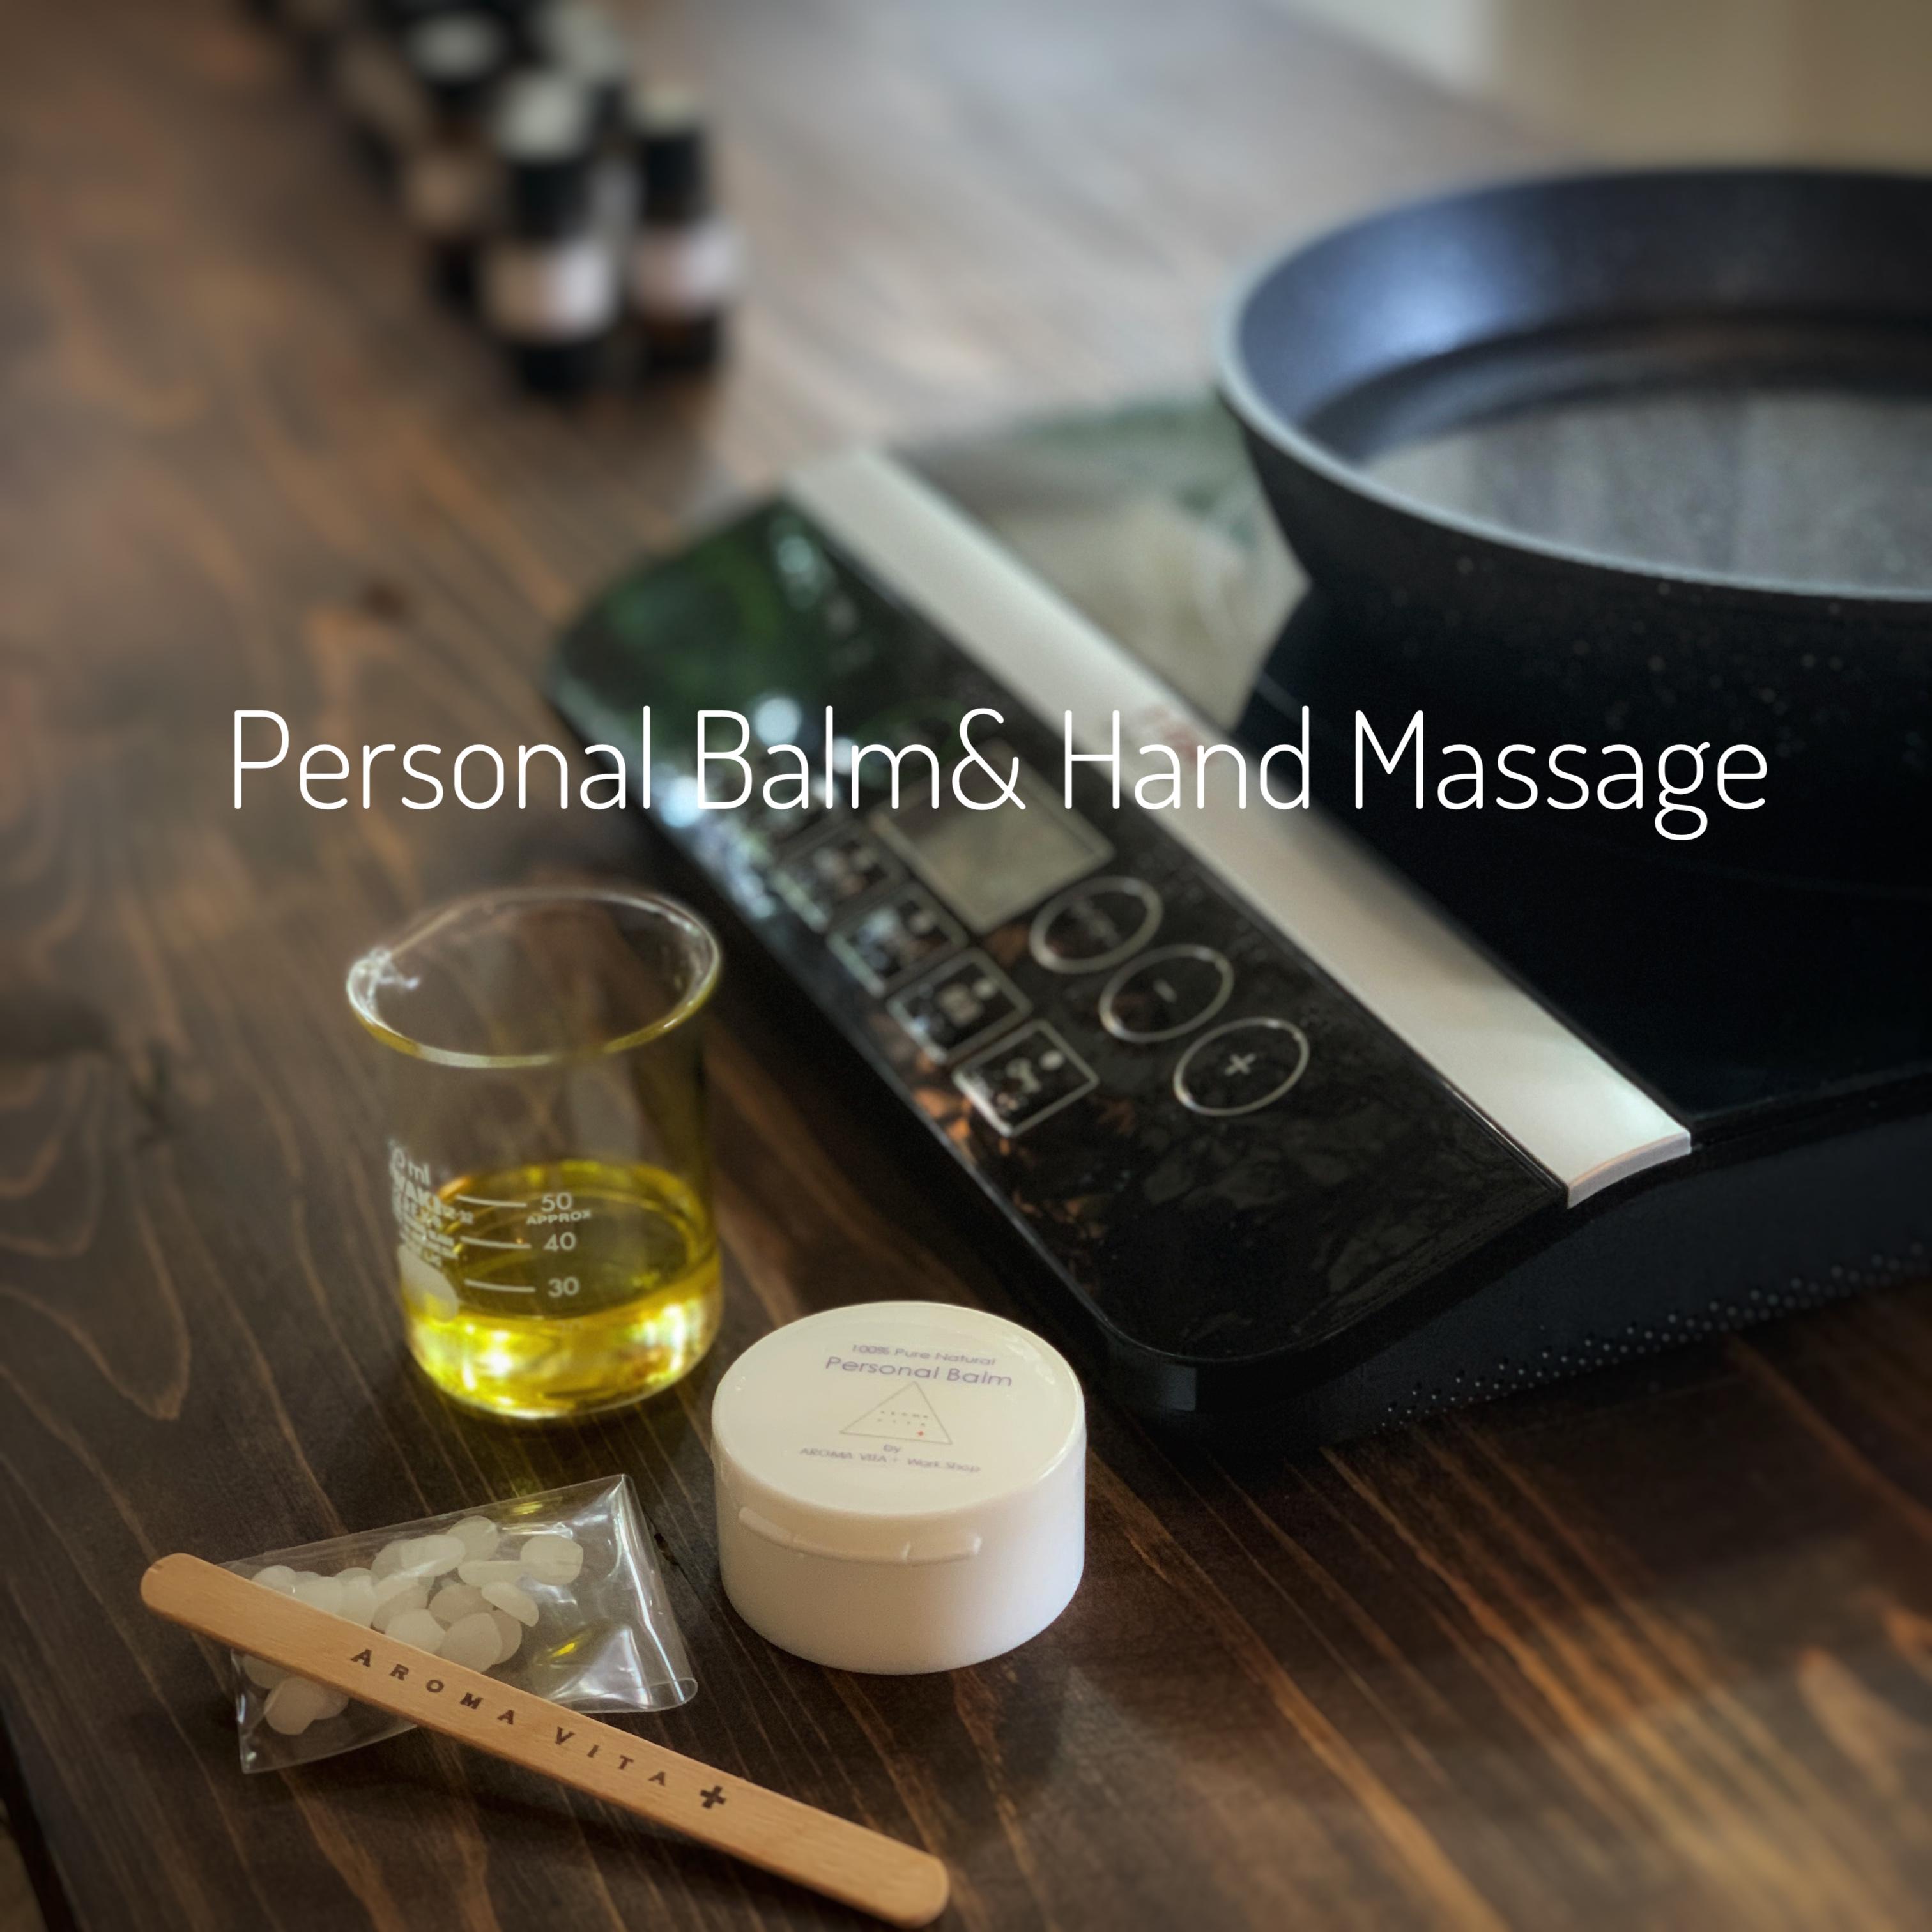 *Personal Balm & Hand Massage